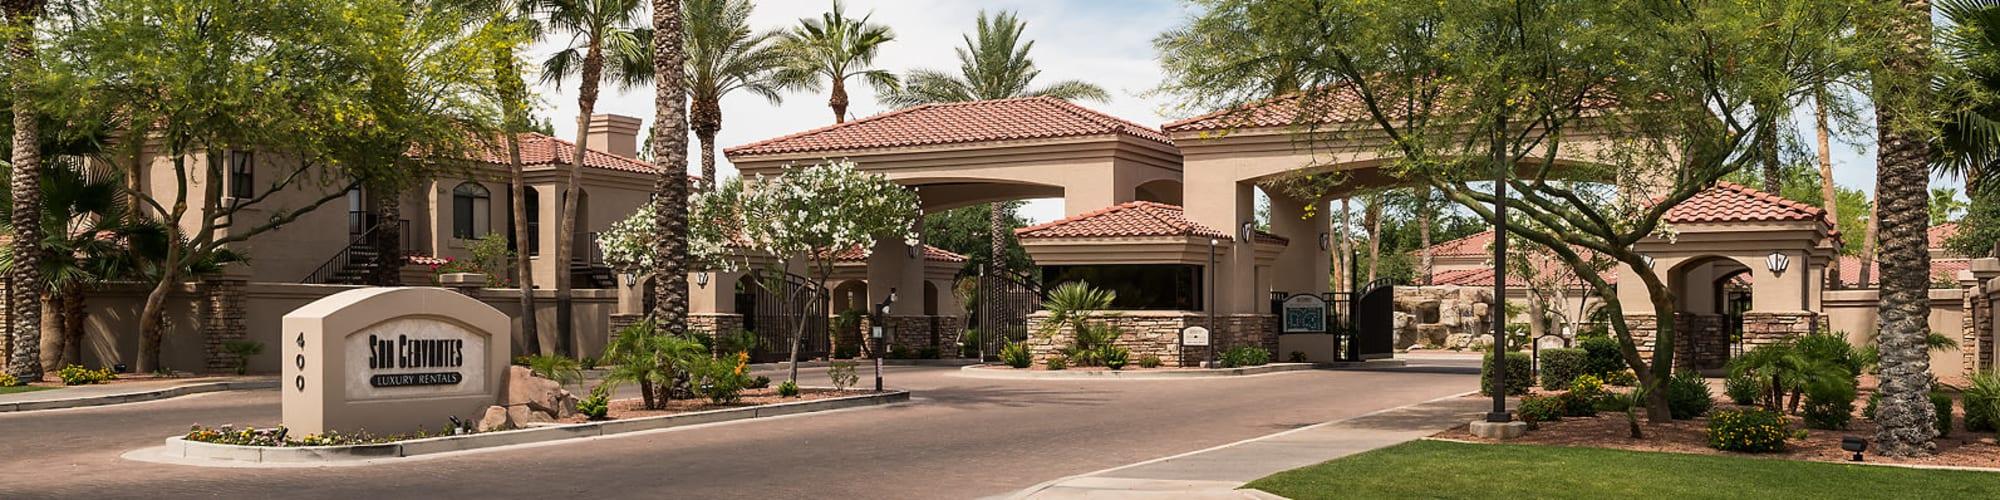 Reviews at San Cervantes in Chandler, Arizona